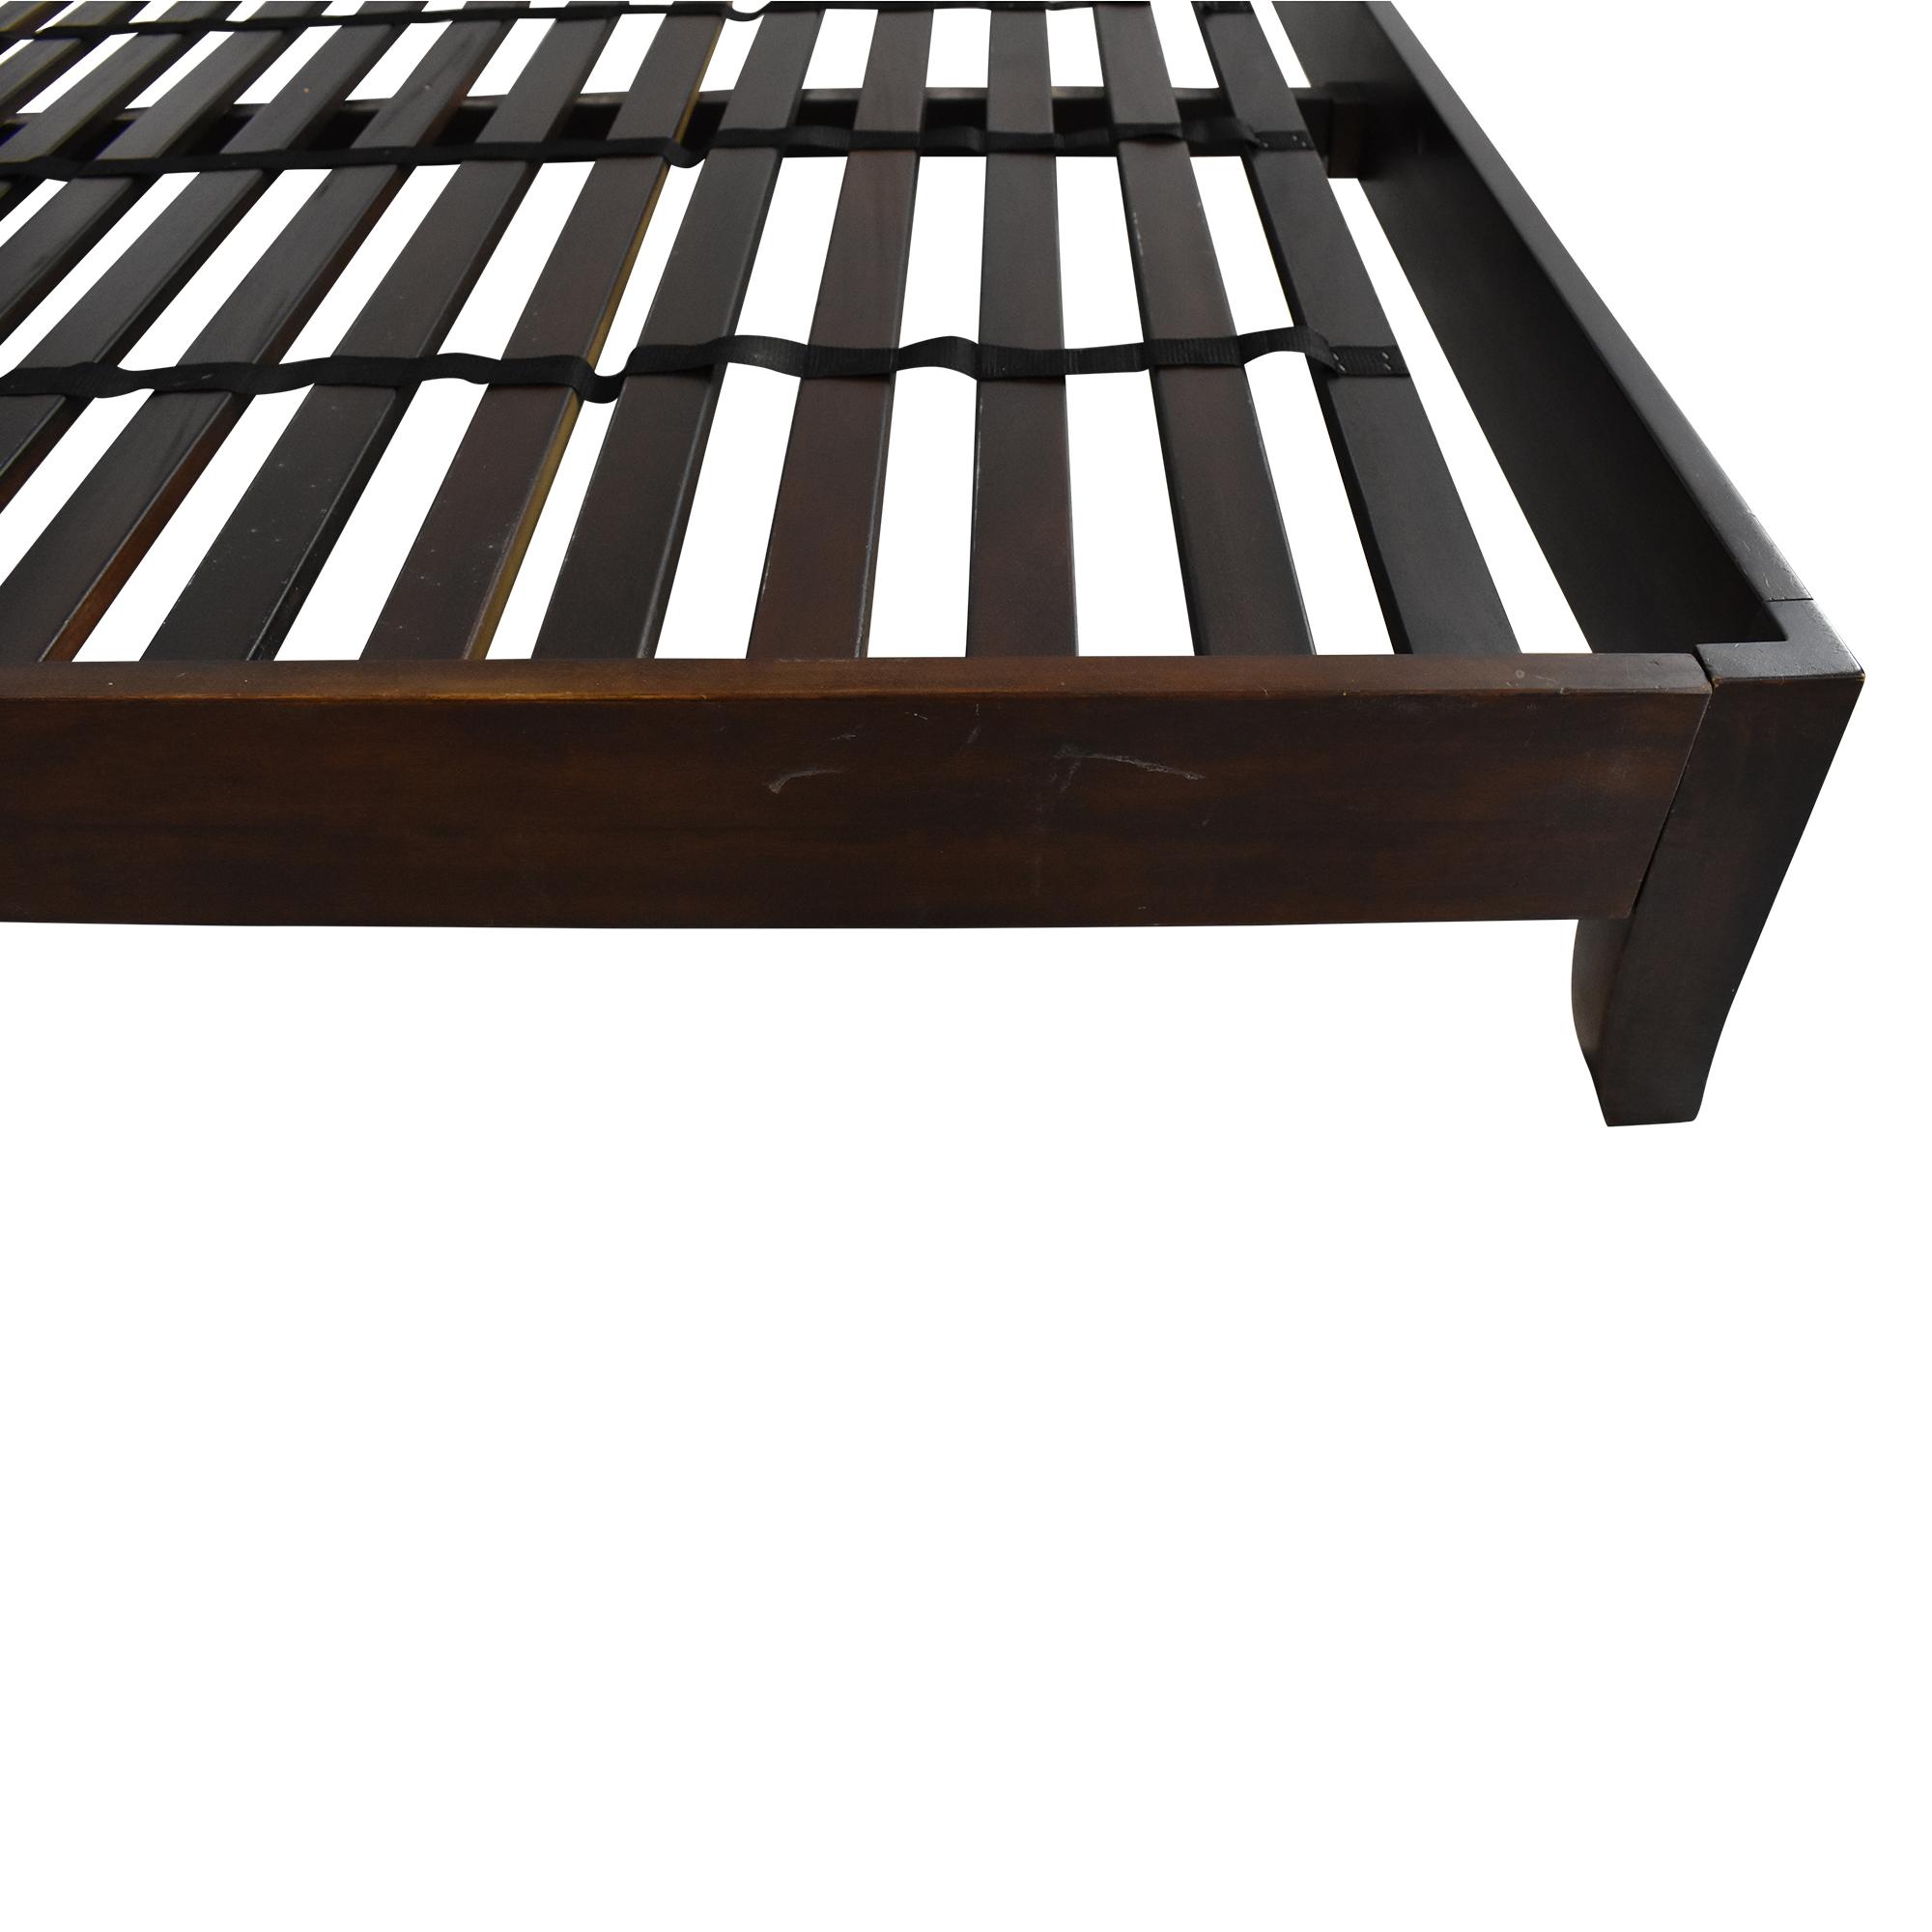 Crate & Barrel Crate & Barrel Dawson King Sleigh Bed Bed Frames